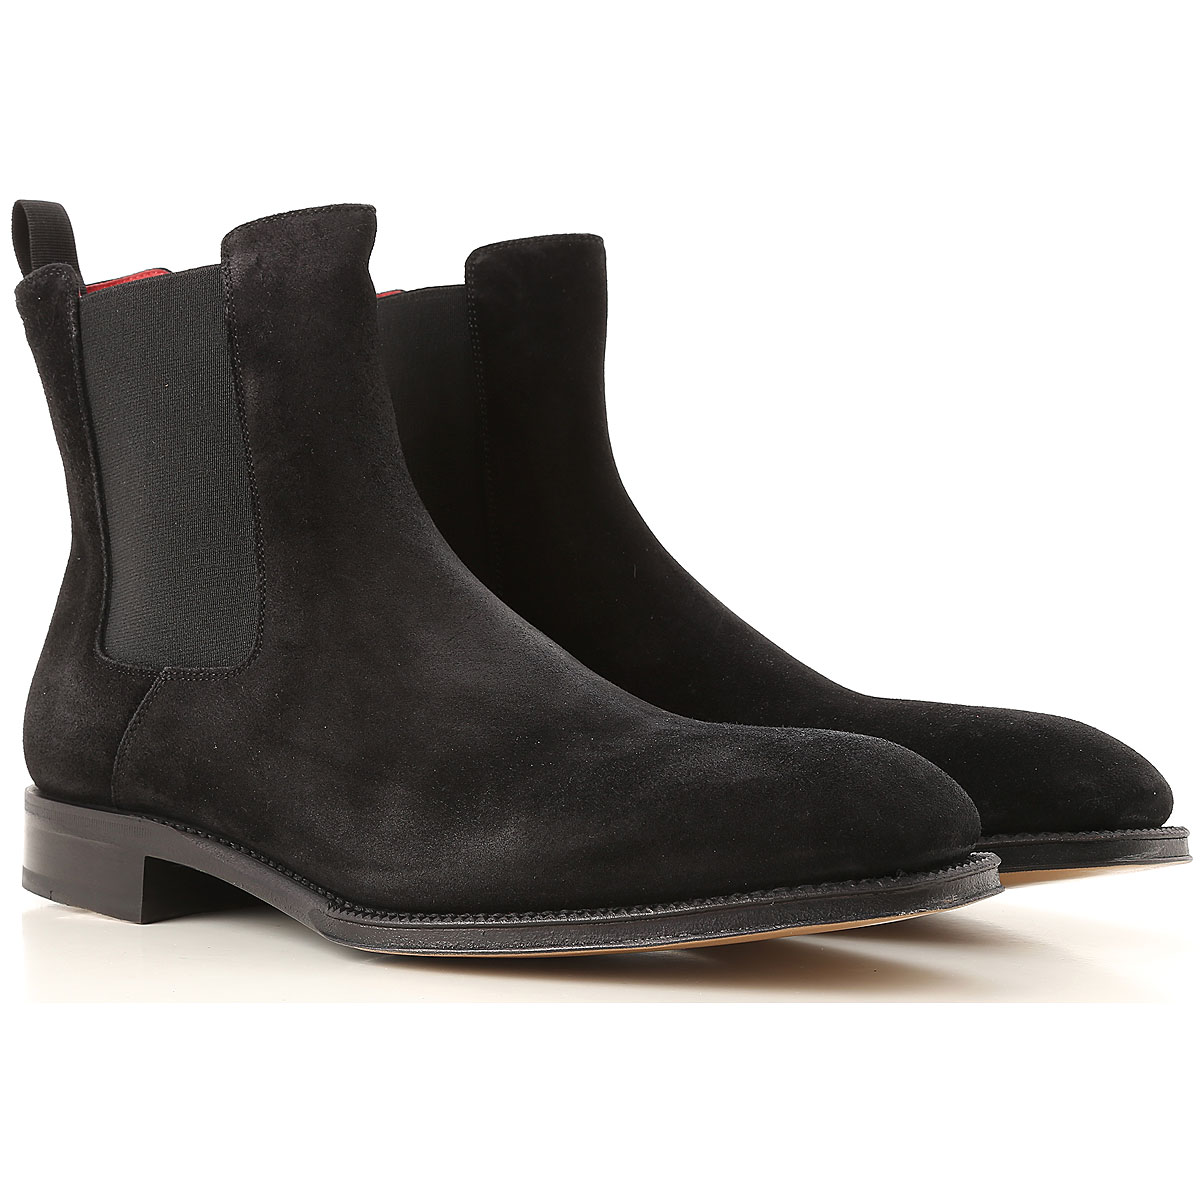 Image of Alexander McQueen Chelsea Boots for Men, Black, suede, 2017, EUR 40 - US 7 - UK 6 EUR 41 - US 8 - UK 7 EUR 42 - US 9 - UK 8 EUR 43 - US 10 - UK 9 EUR 44 - US 11 - UK 10 EUR 45 - US 12 - UK 11